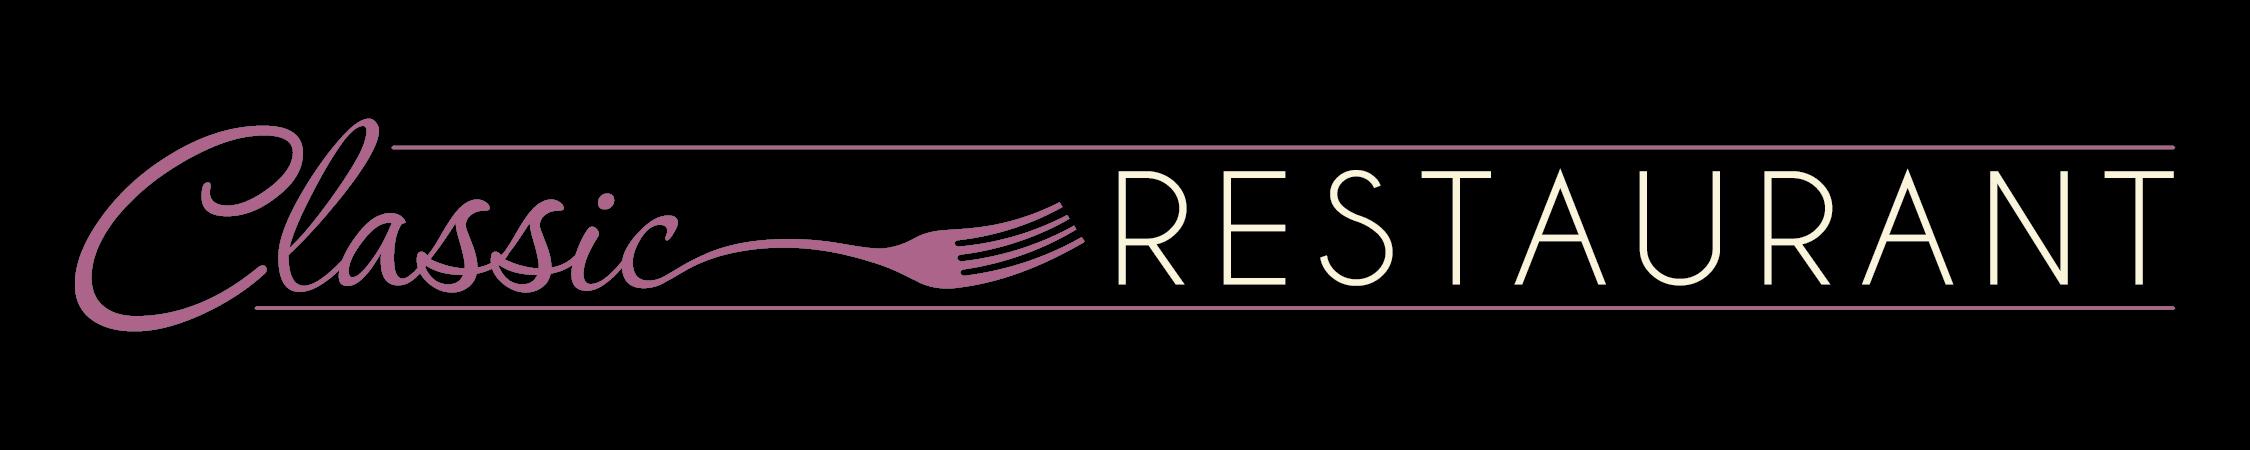 Classic Restaurant Long Logo